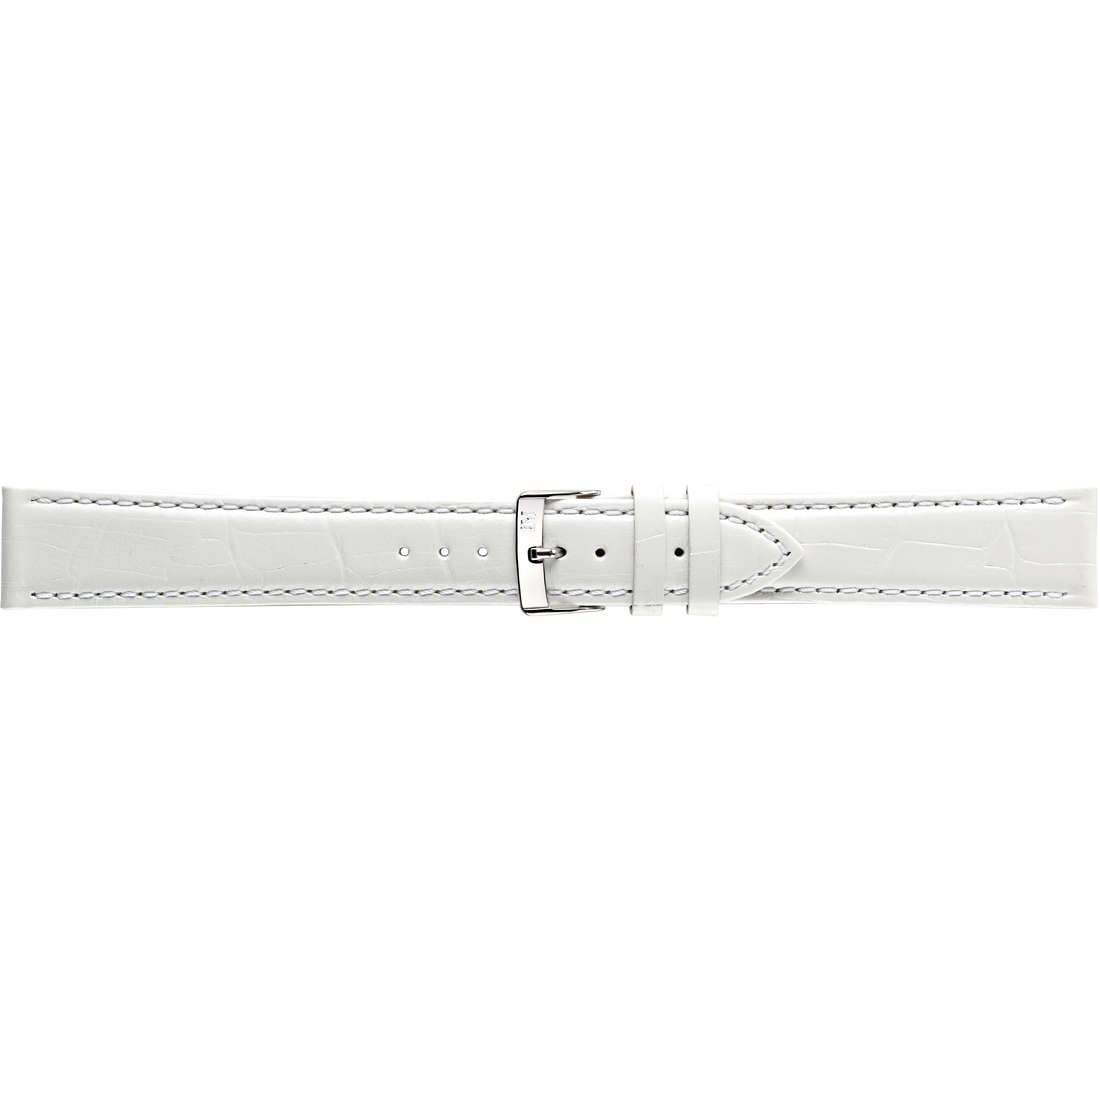 watch watch bands watch straps unisex Morellato I Lunghi A01Y2269480017CR20